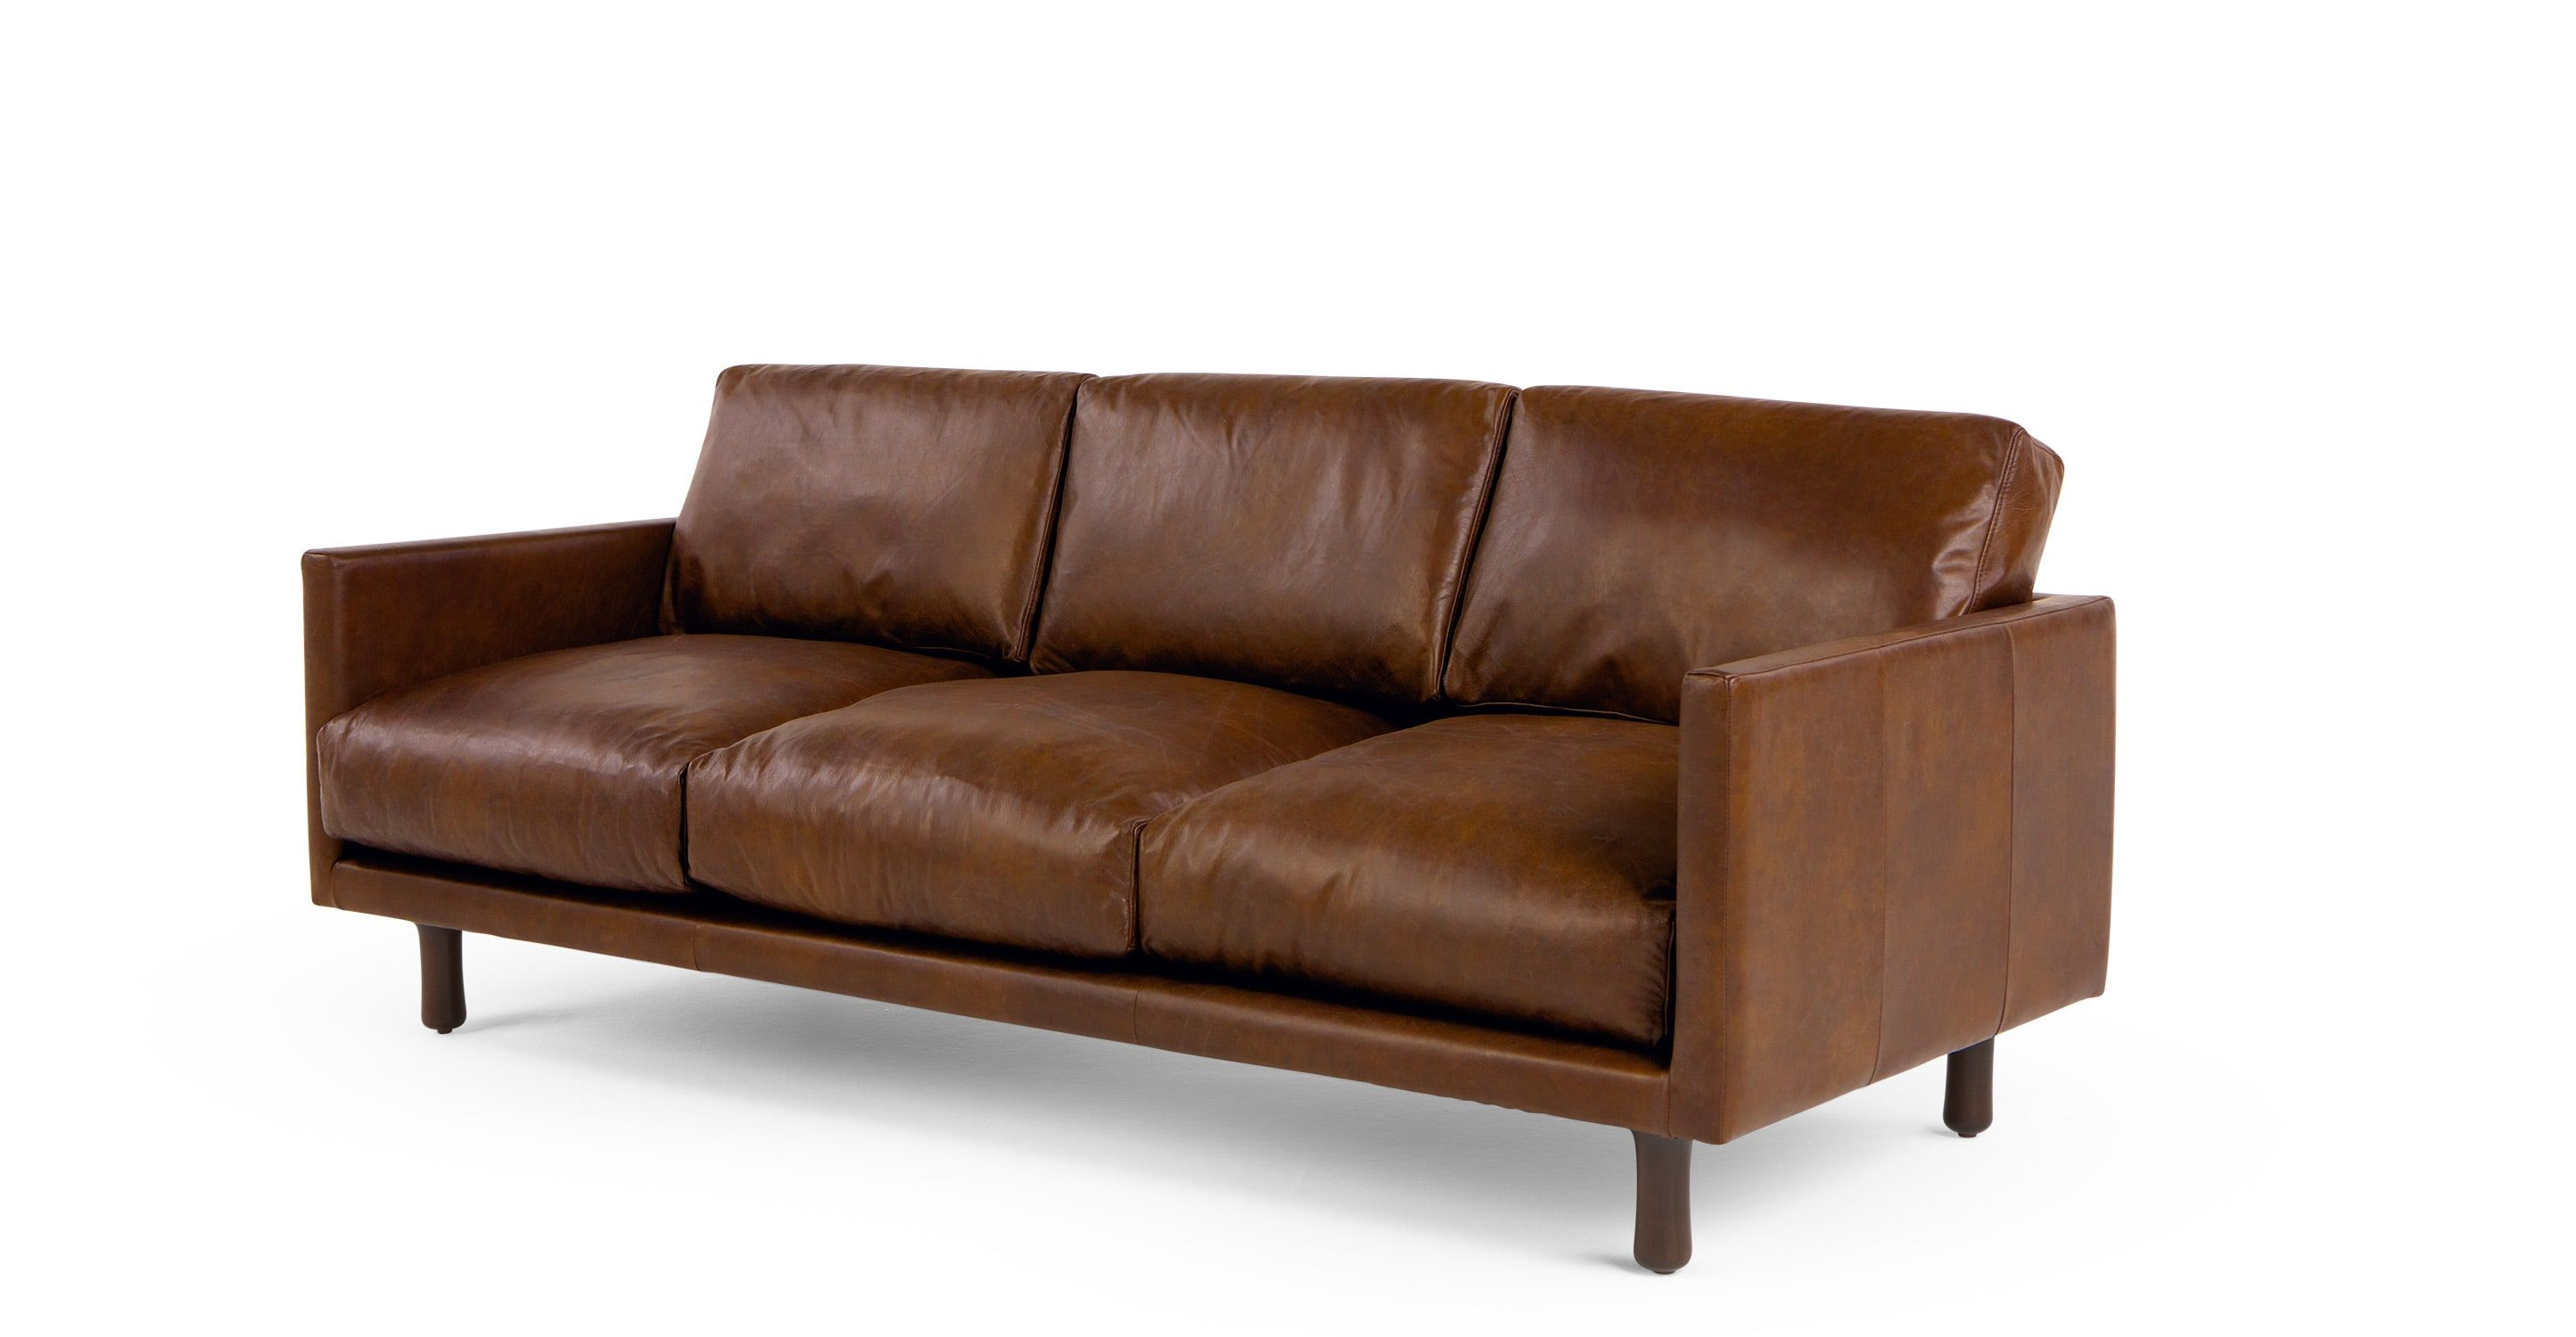 Carey 3 Sitzer Sofa hellbraunes Premium Leder